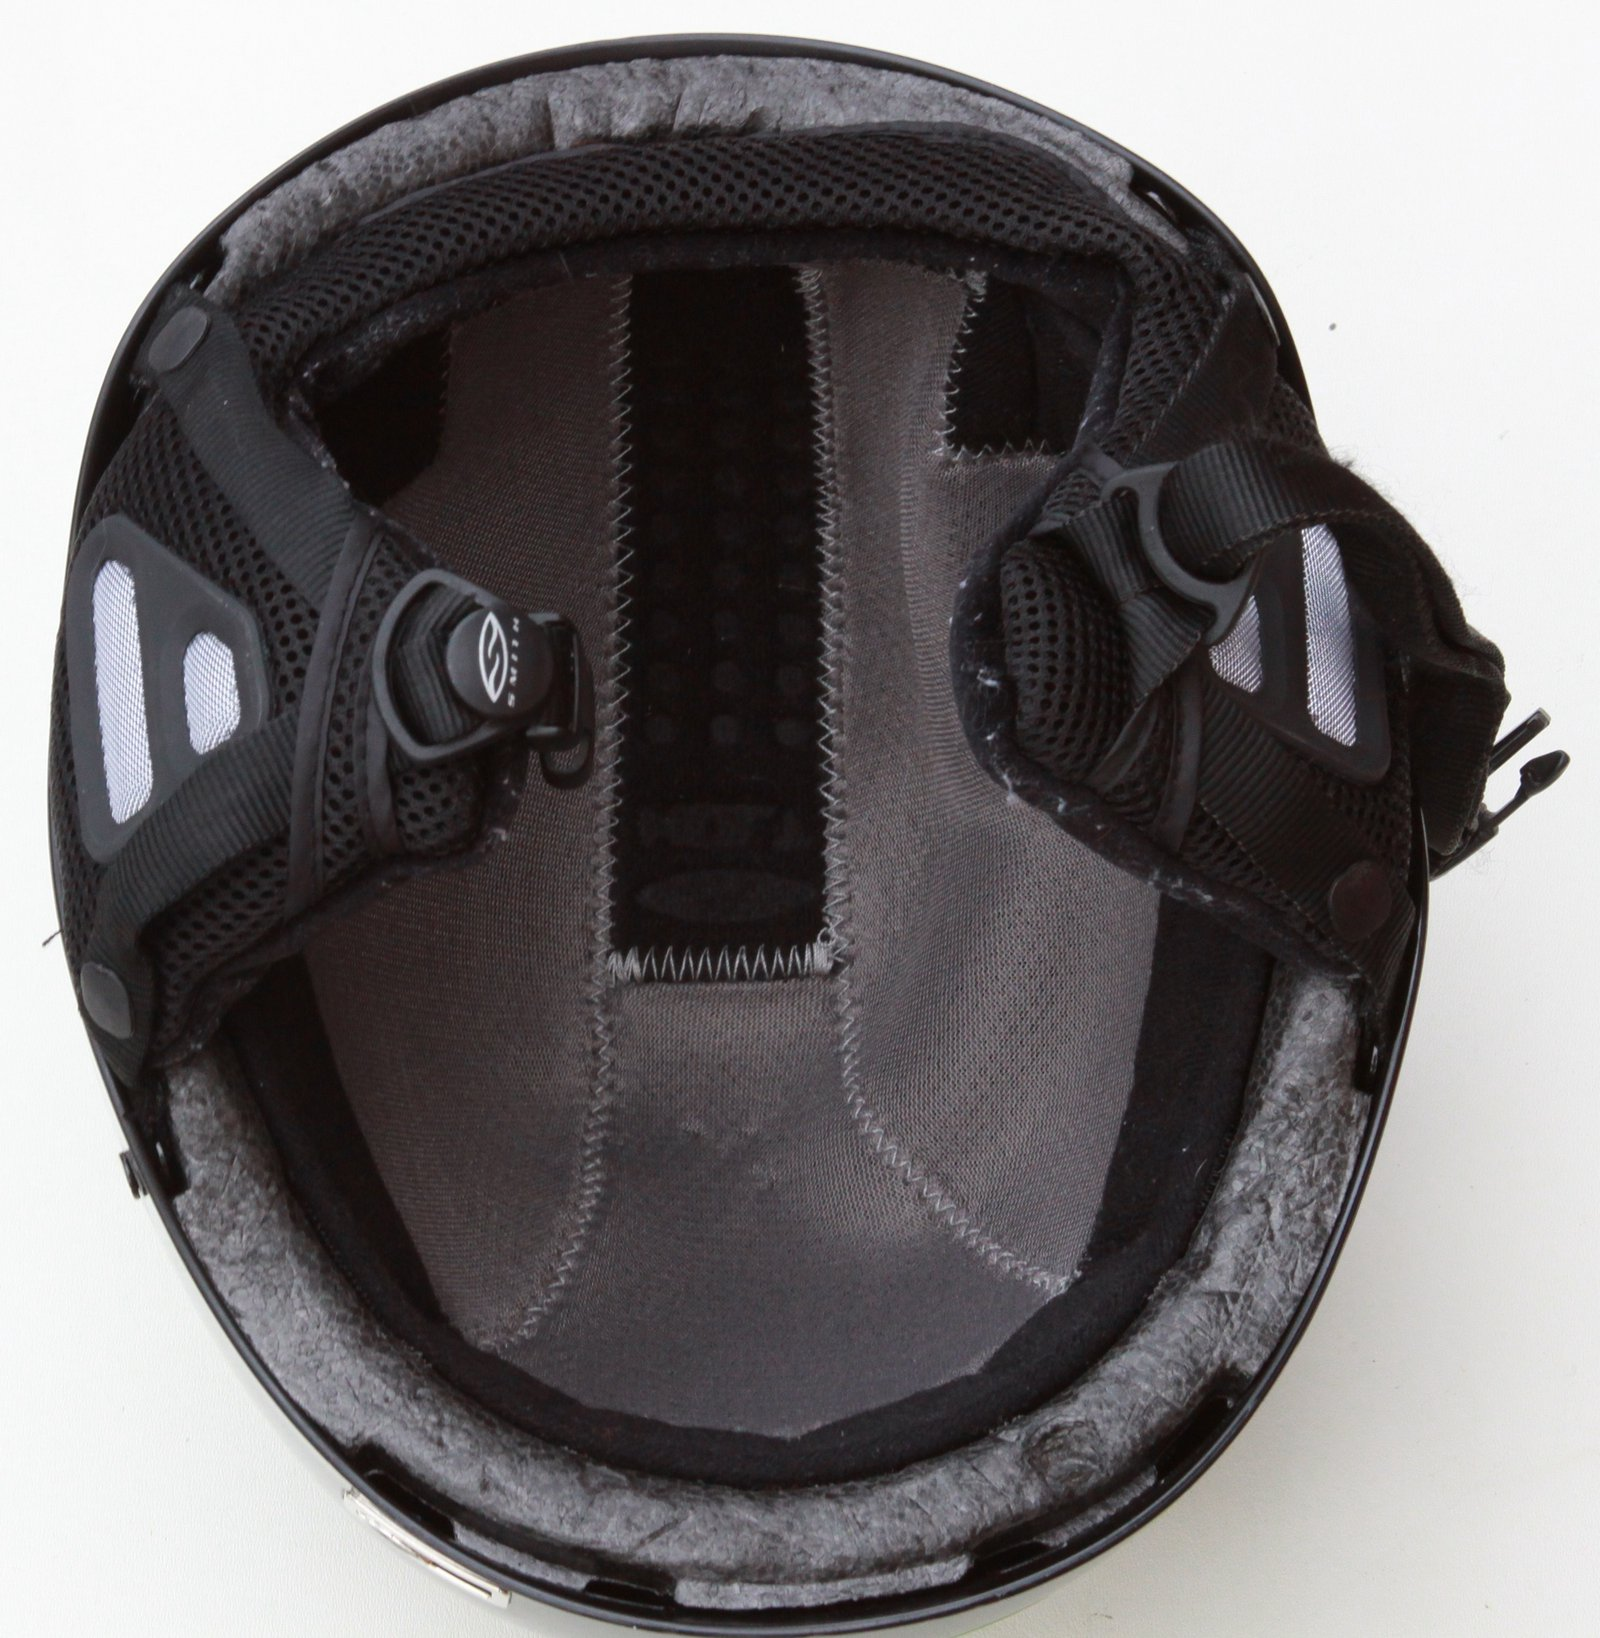 Ski gear - 11 of 17